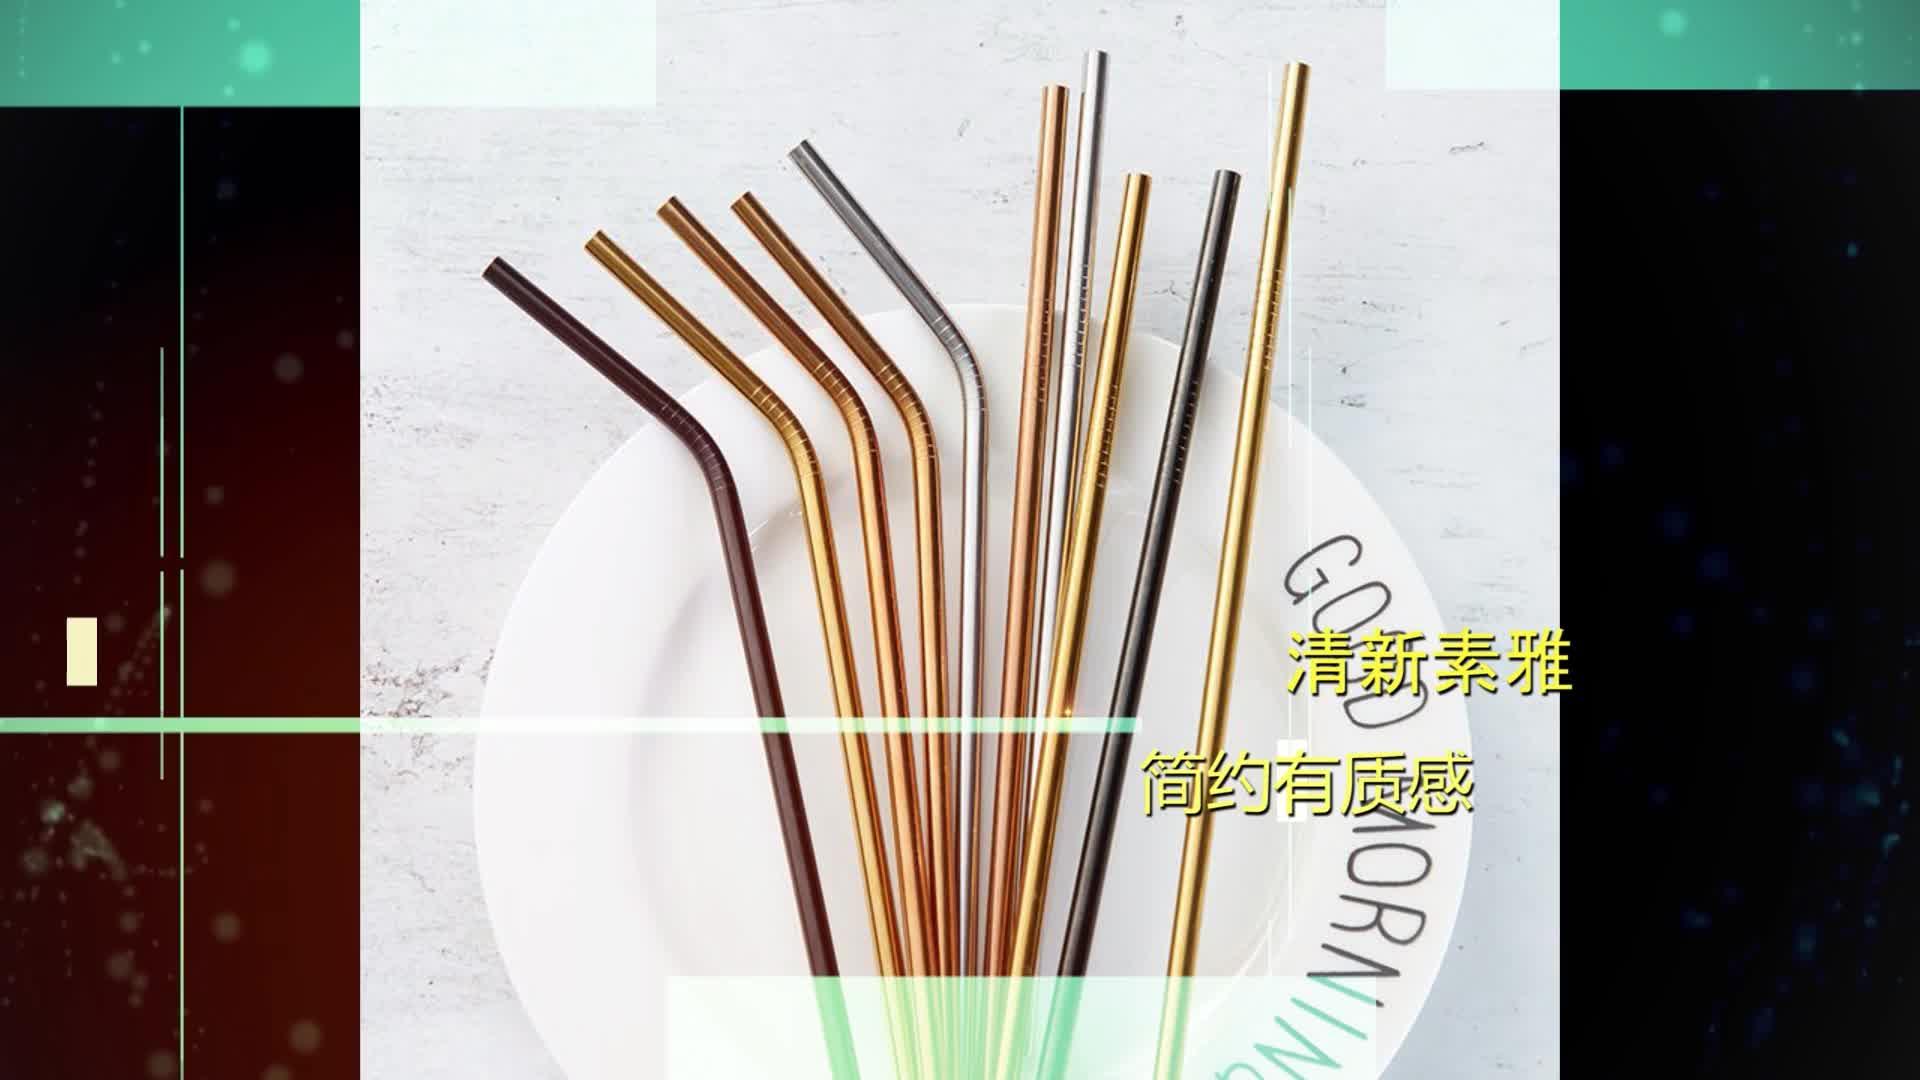 265*8mm Eco-Friendly Milkshake Bubble Tea Straws Metal Stainless Steel Drinking Straws